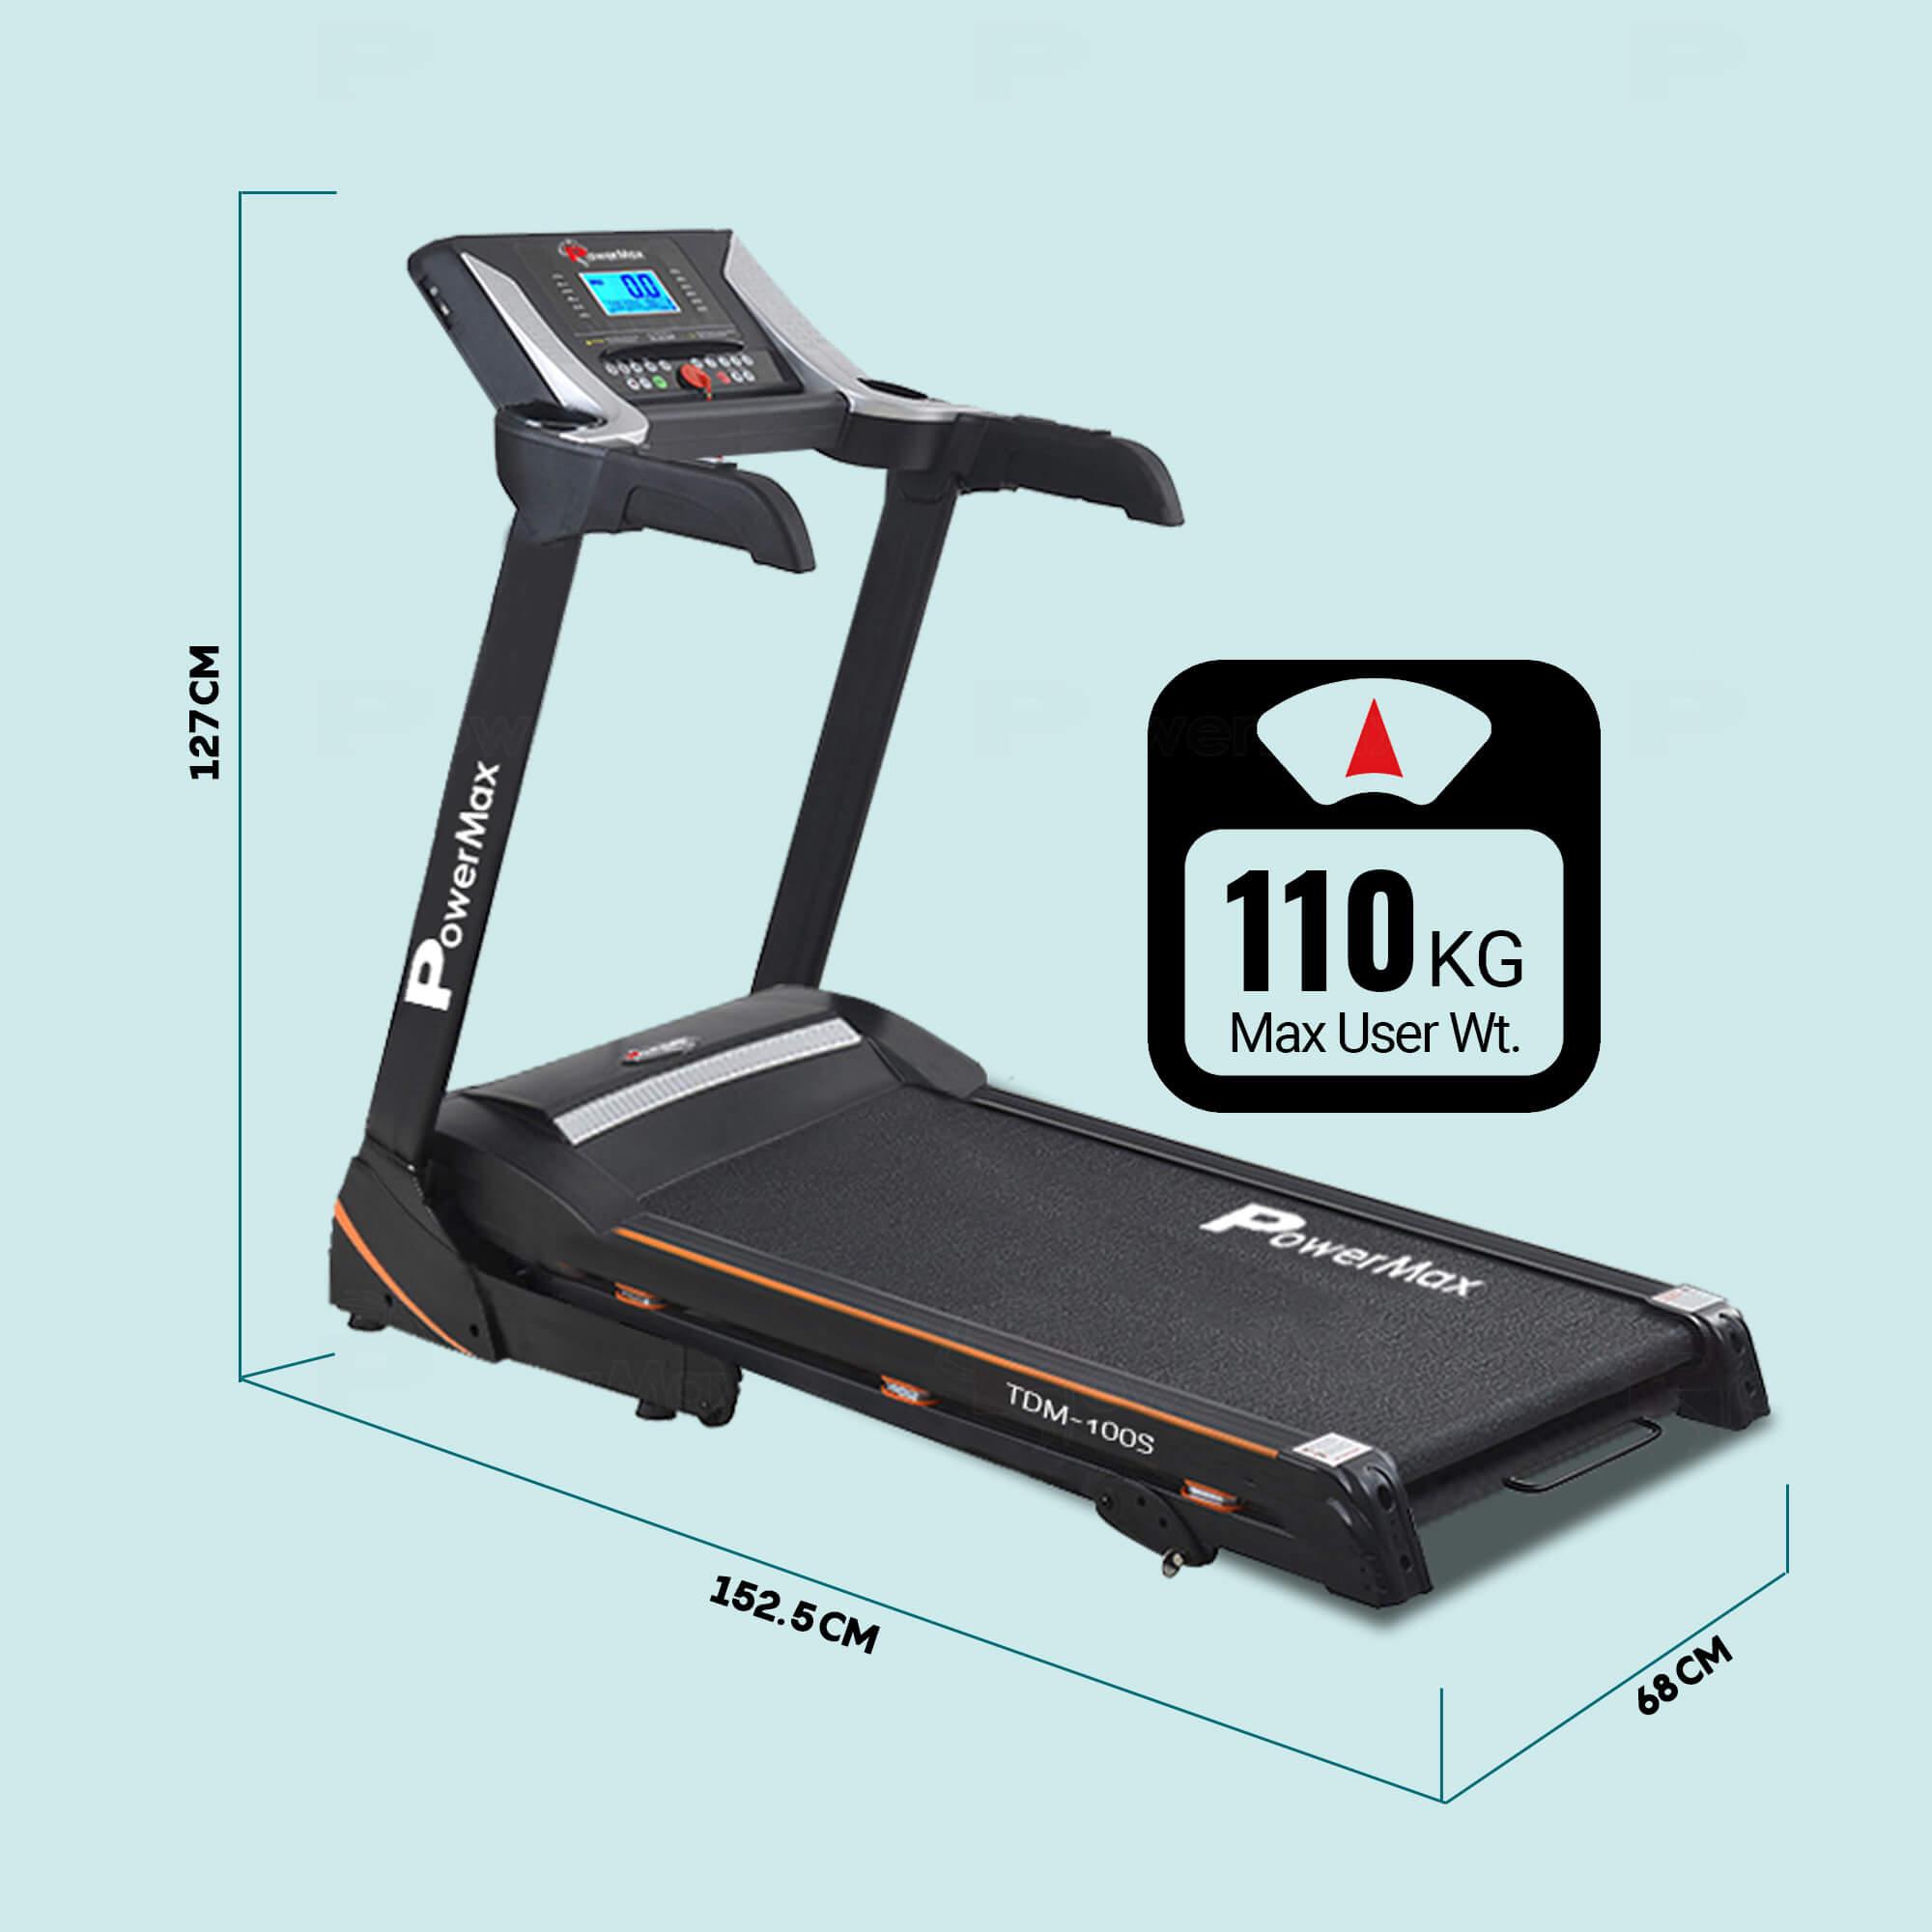 Powermax Fitness TDM-100S-V2 (1.5HP) Motorized Treadmill with Jumping Wheel & Auto Lubrication